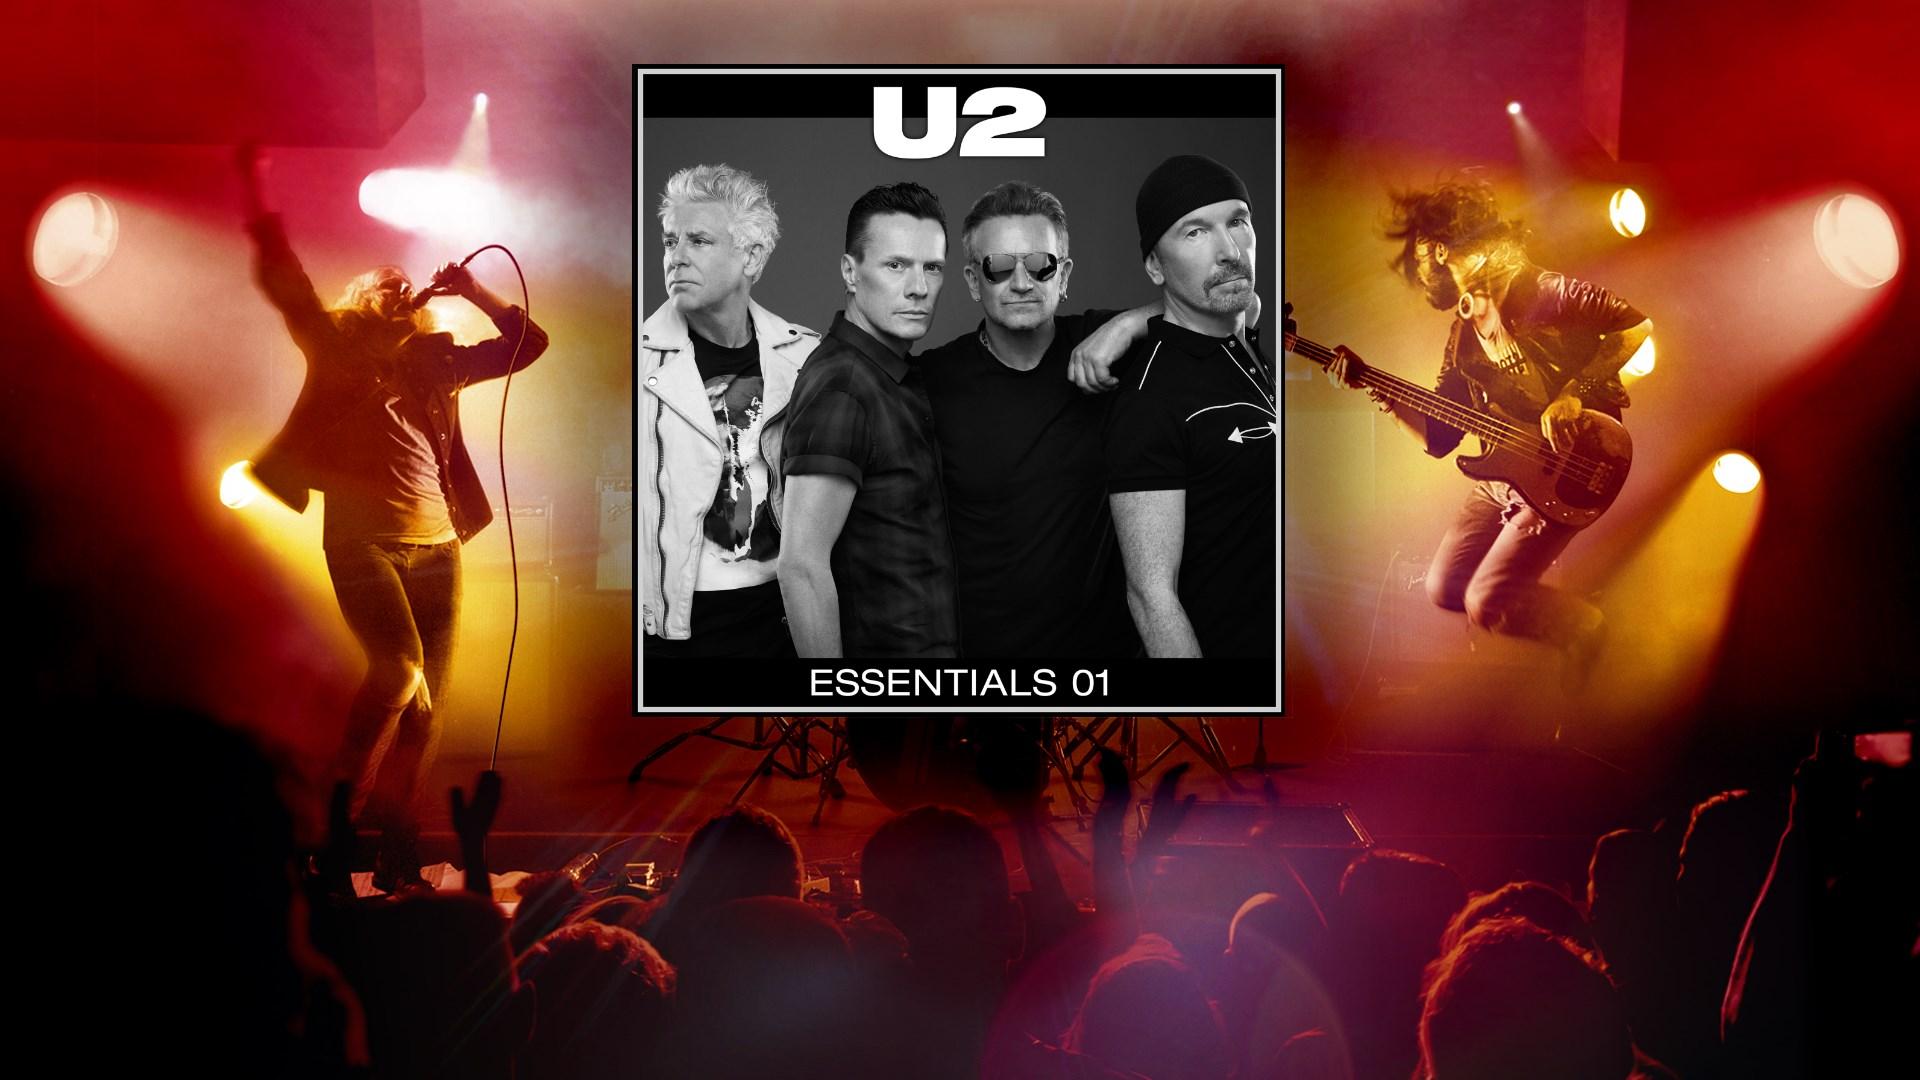 U2 Essentials 01